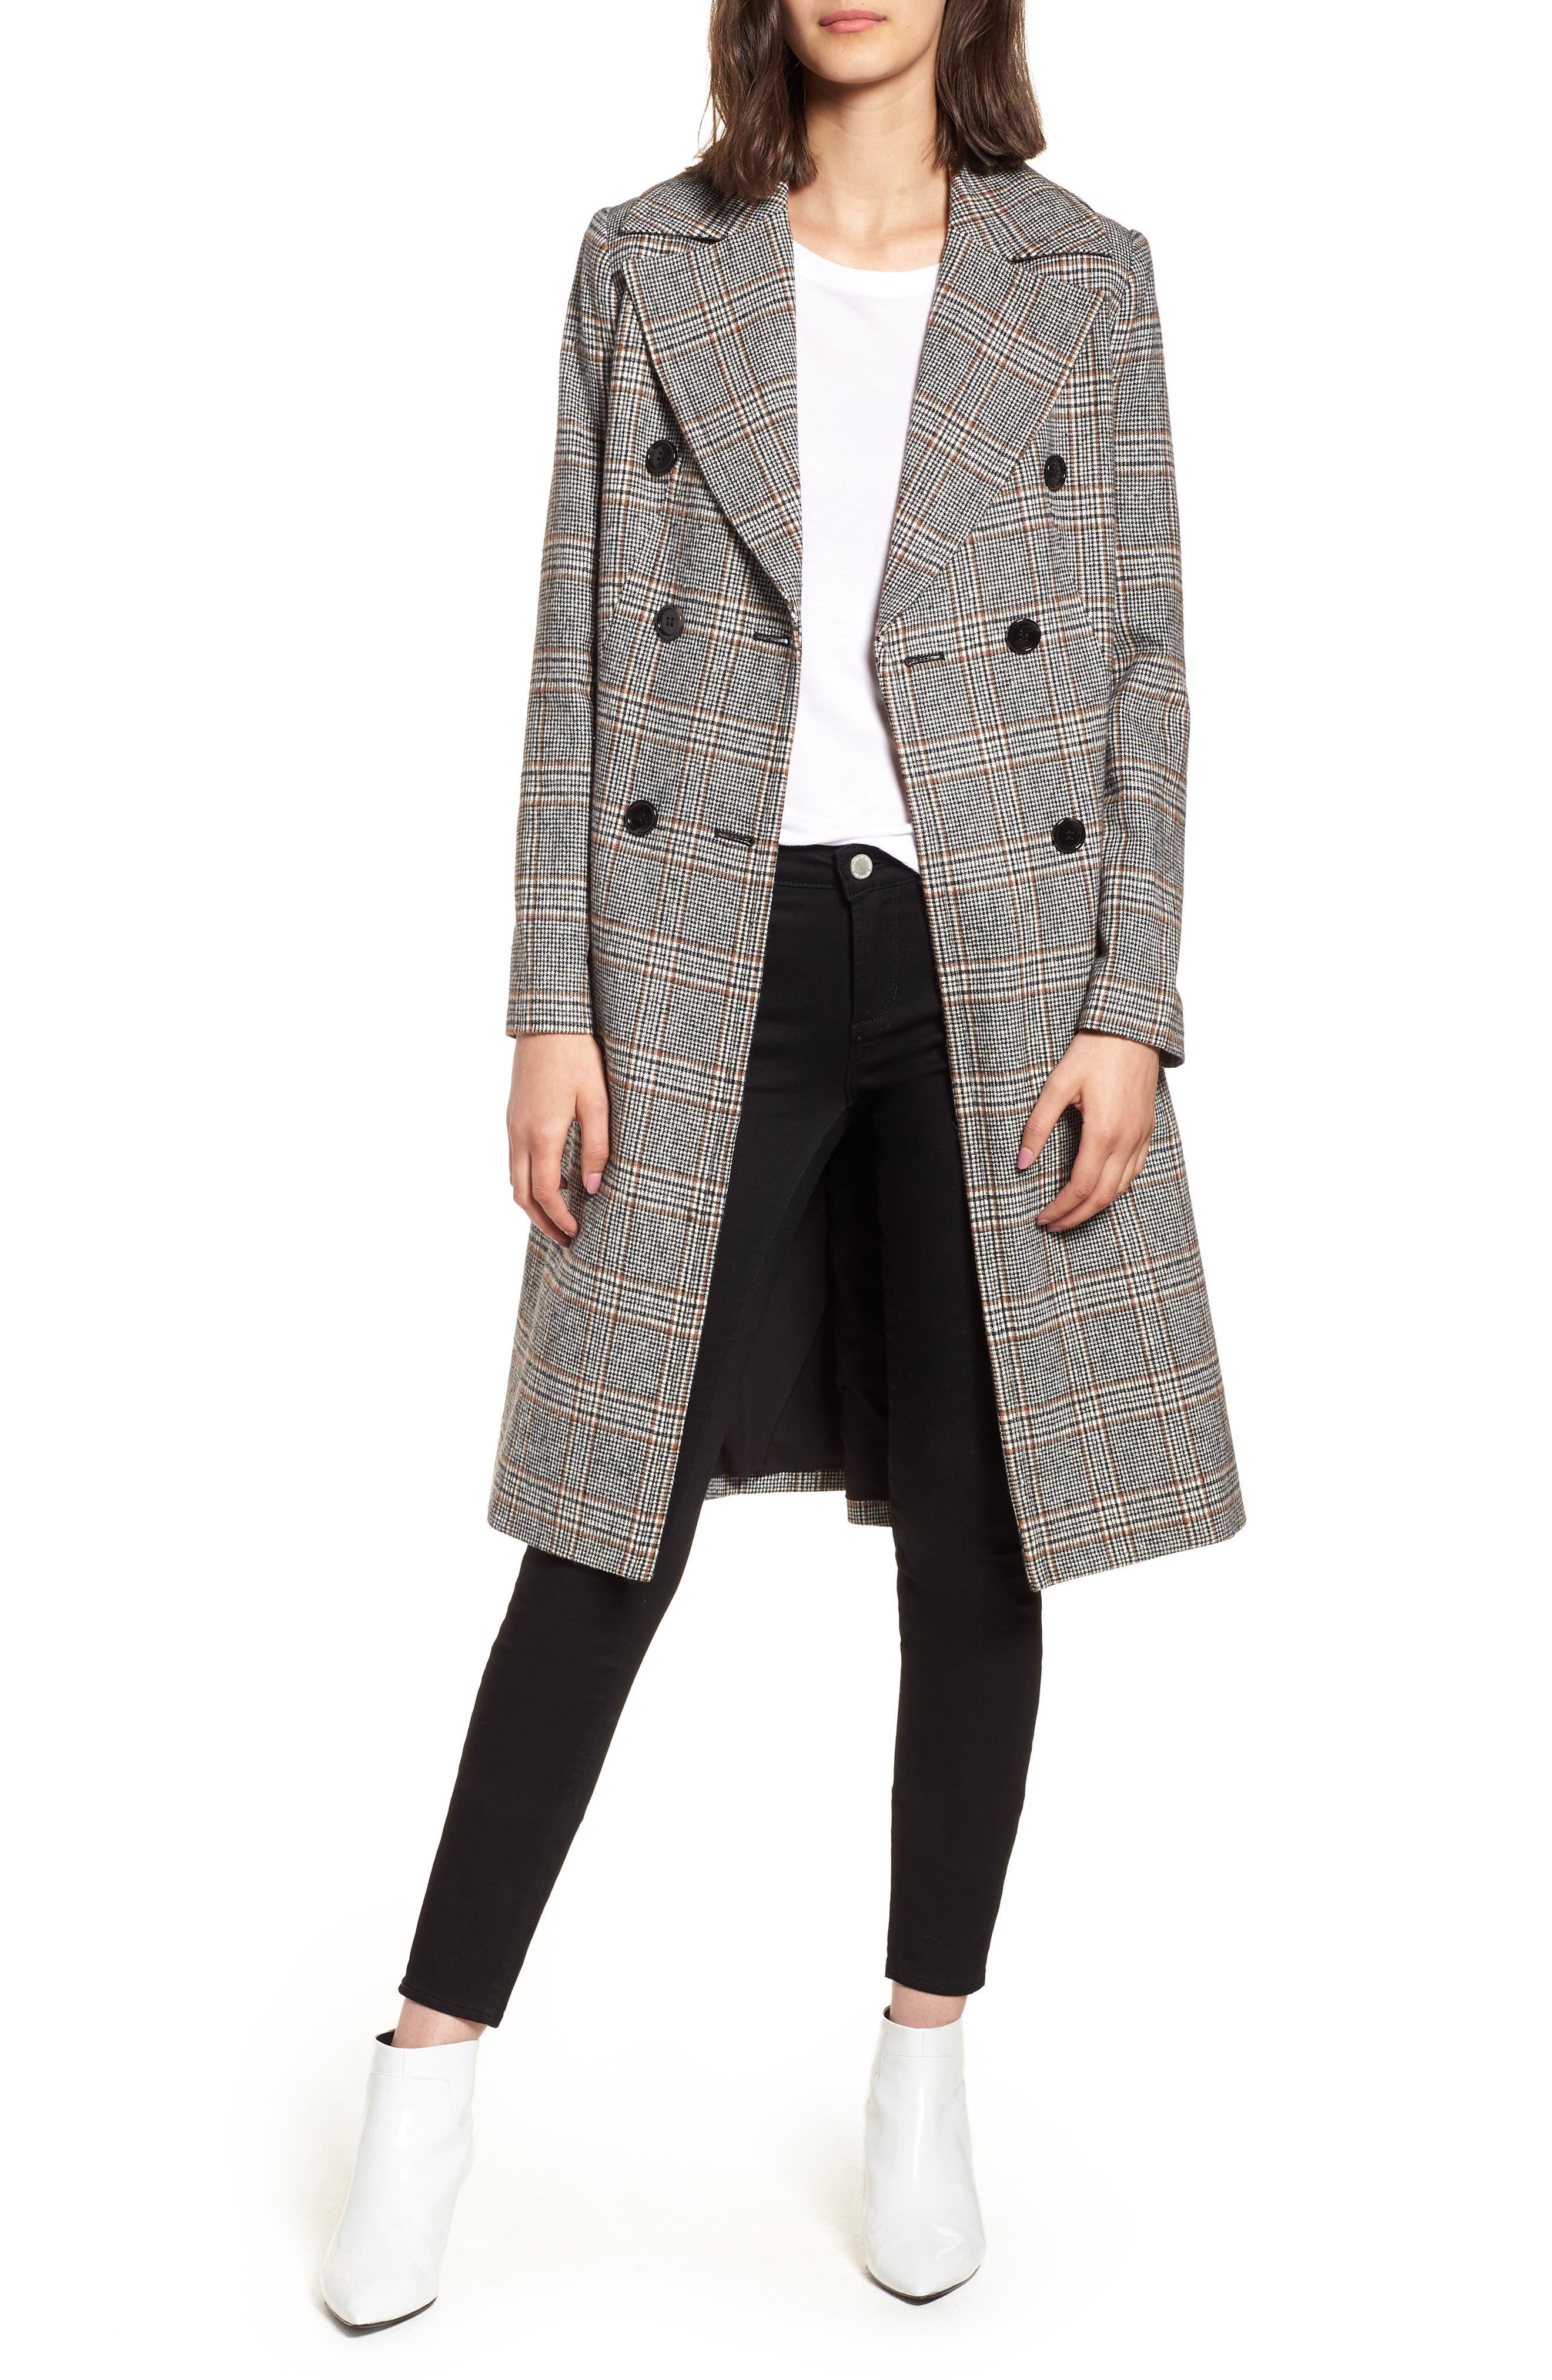 MURAL Blazer Midi Coat, Main, color, 001